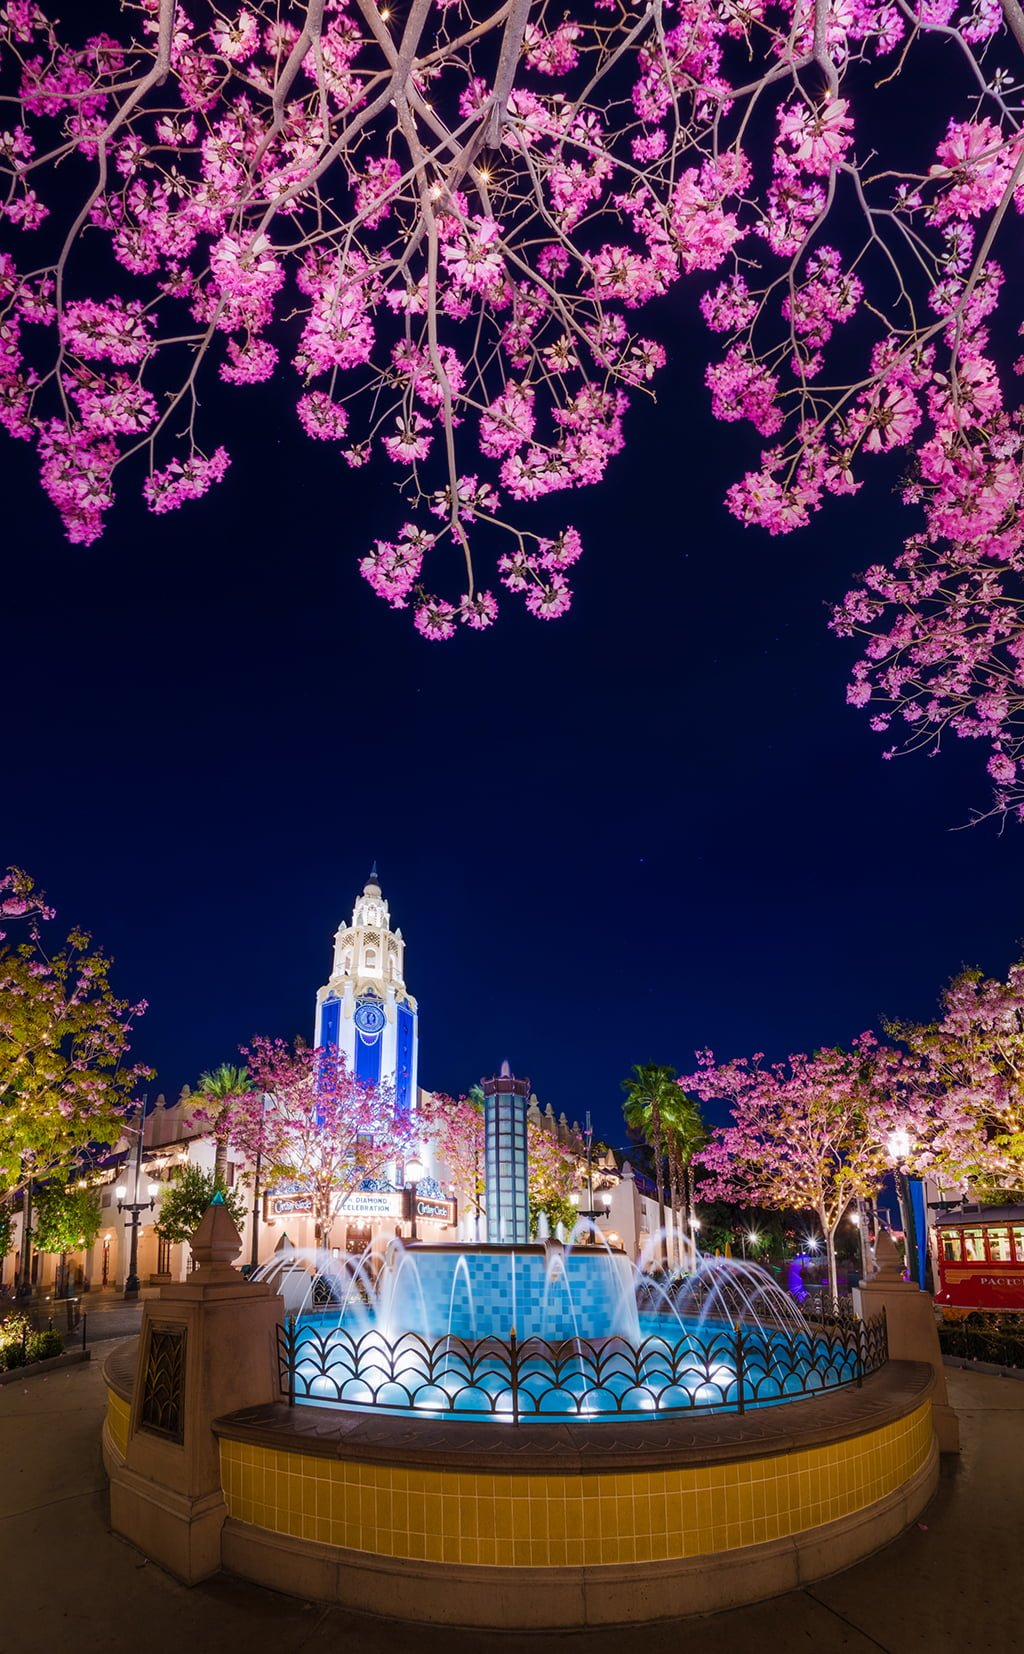 Iphone 6 Quote Wallpapers Disneyland Spring 2016 Construction Update Disney